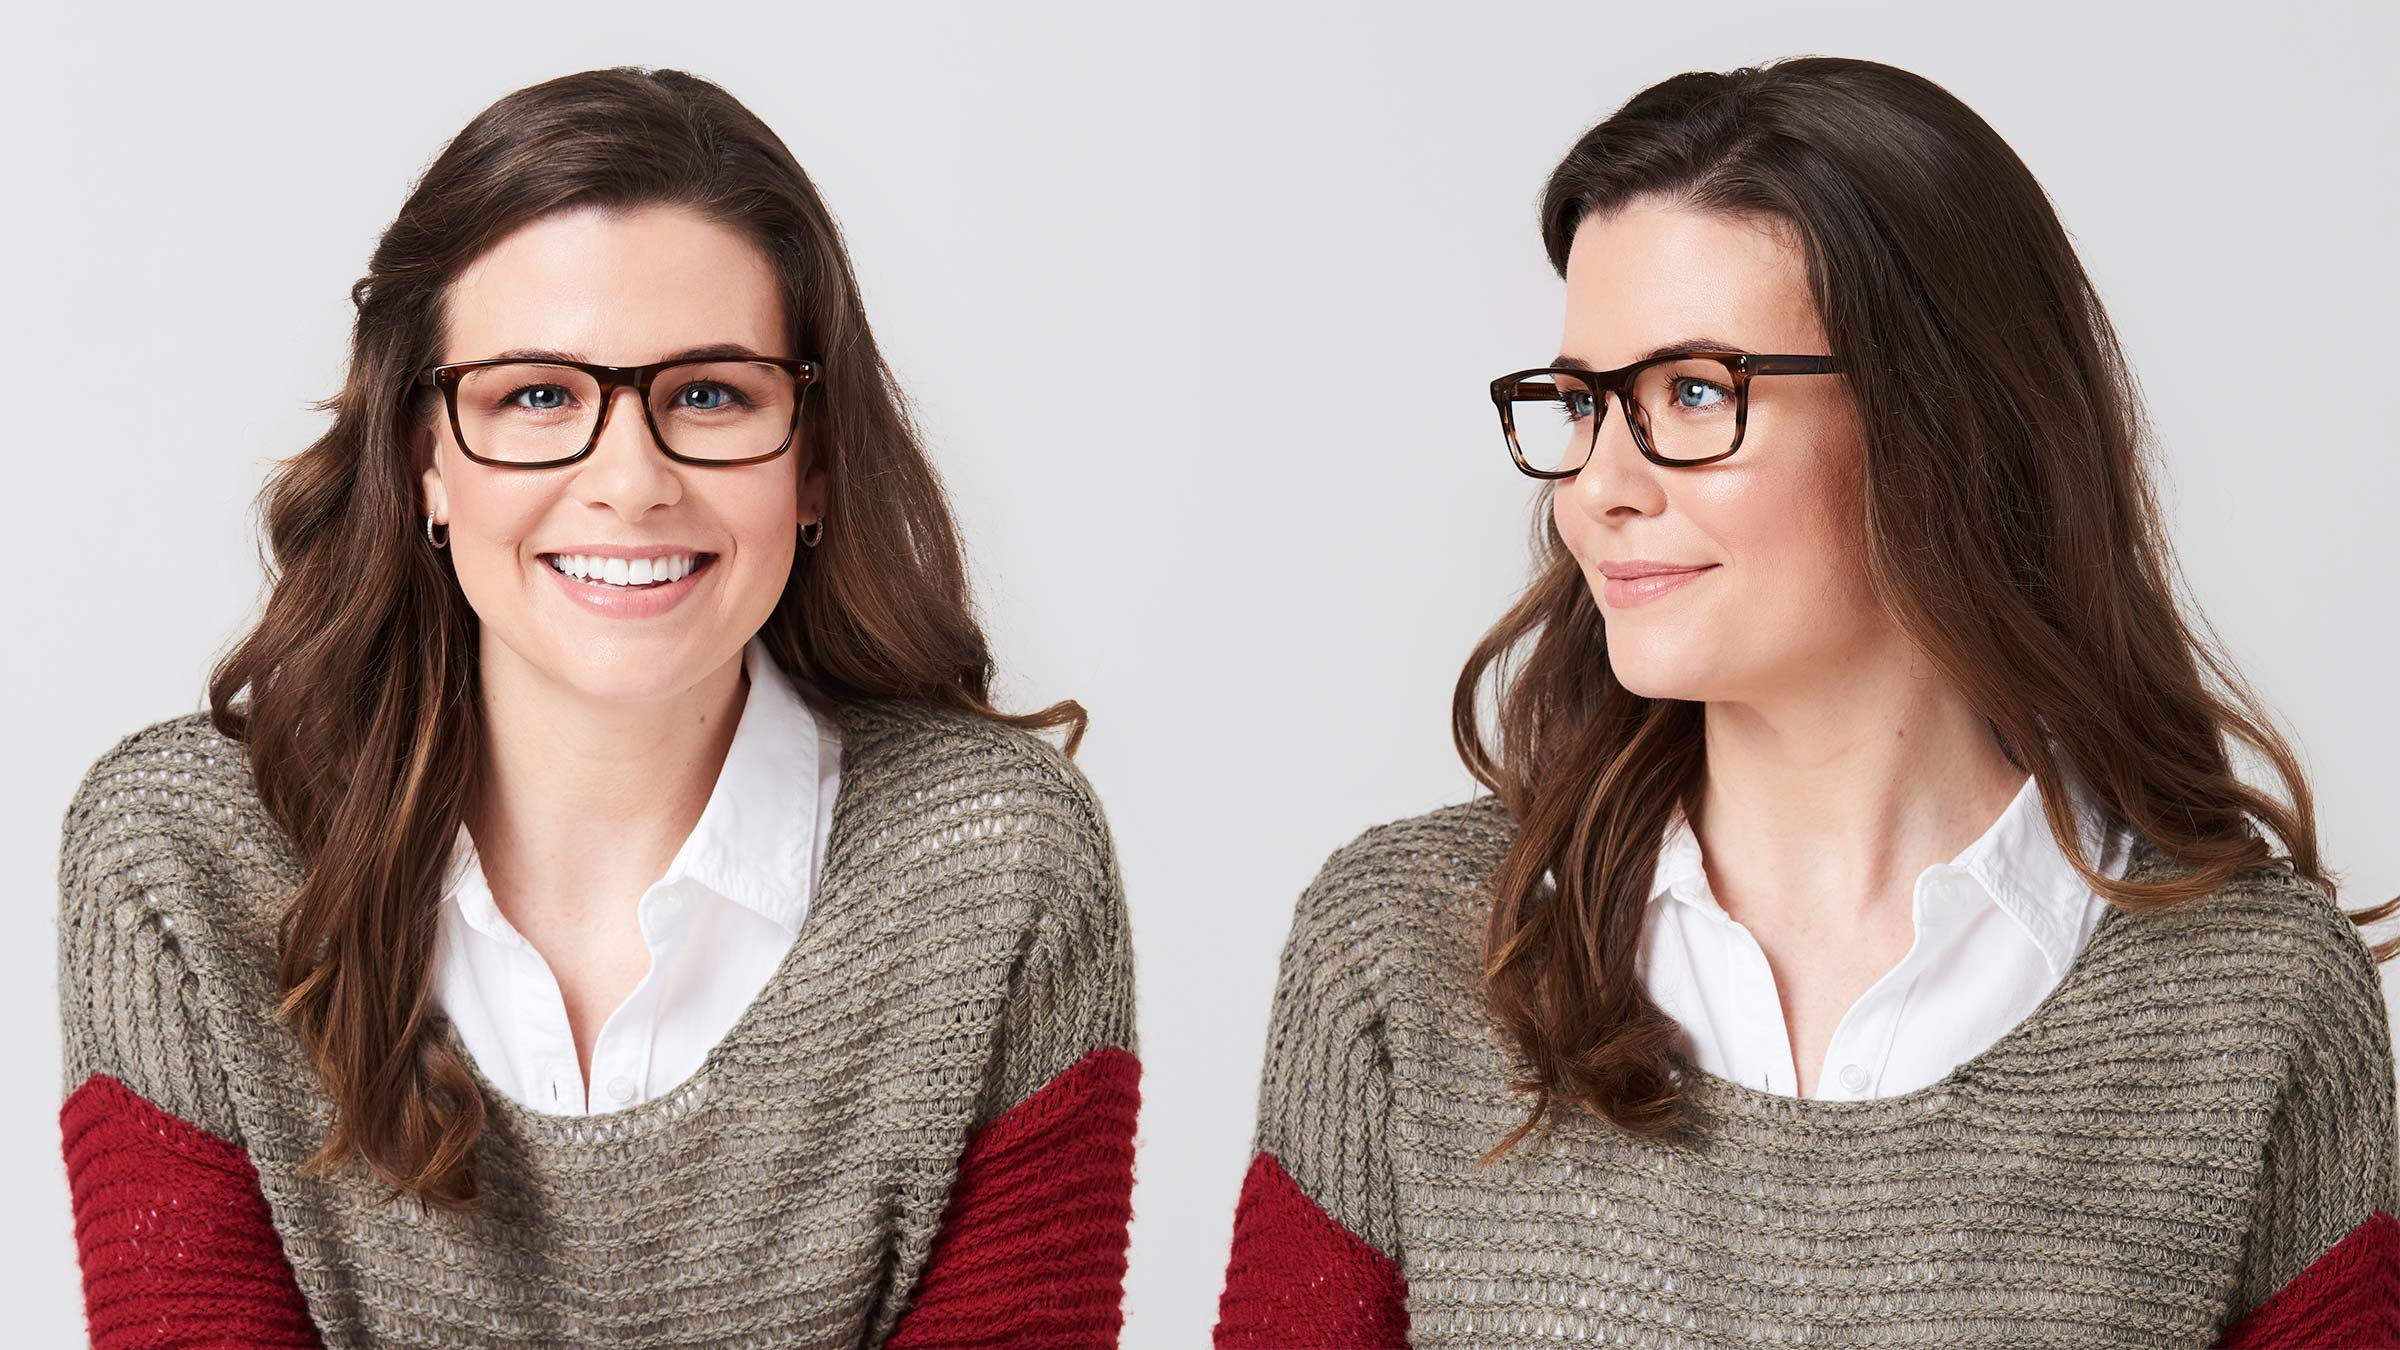 Pixel Eyewear Designer Computer Glasses with Anti-Blue Light Tint UV Protection, Anti-Glare, Full Rim, Acetate Frame Black Color - Buteo Style by Pixel Eyewear (Image #7)